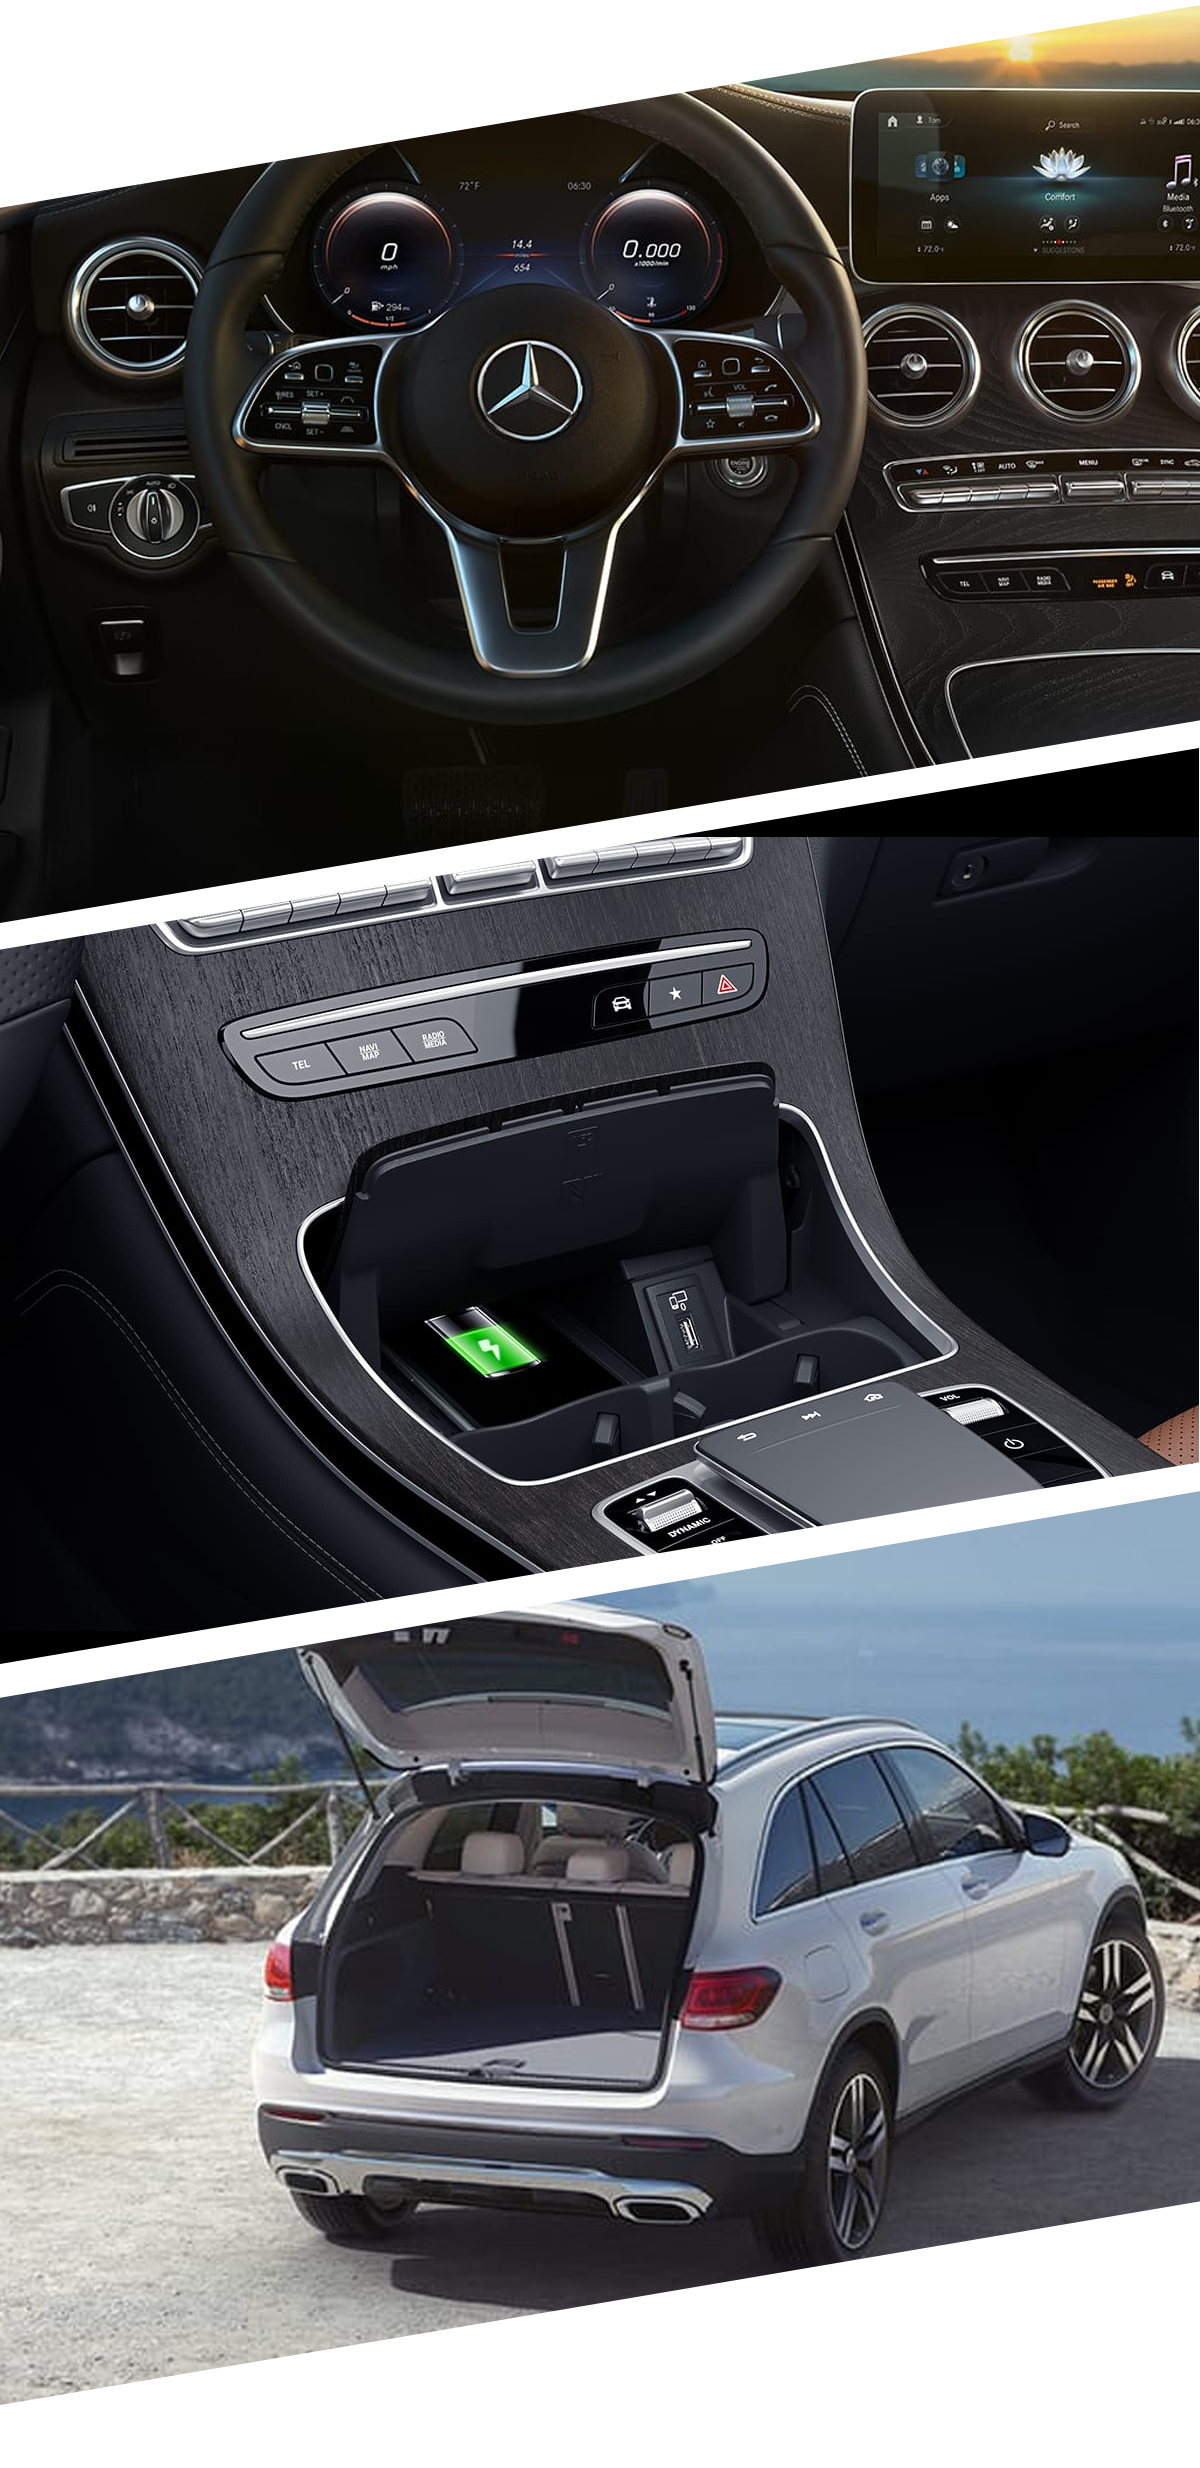 2021 Mercedes-Benz GLC Interior Images